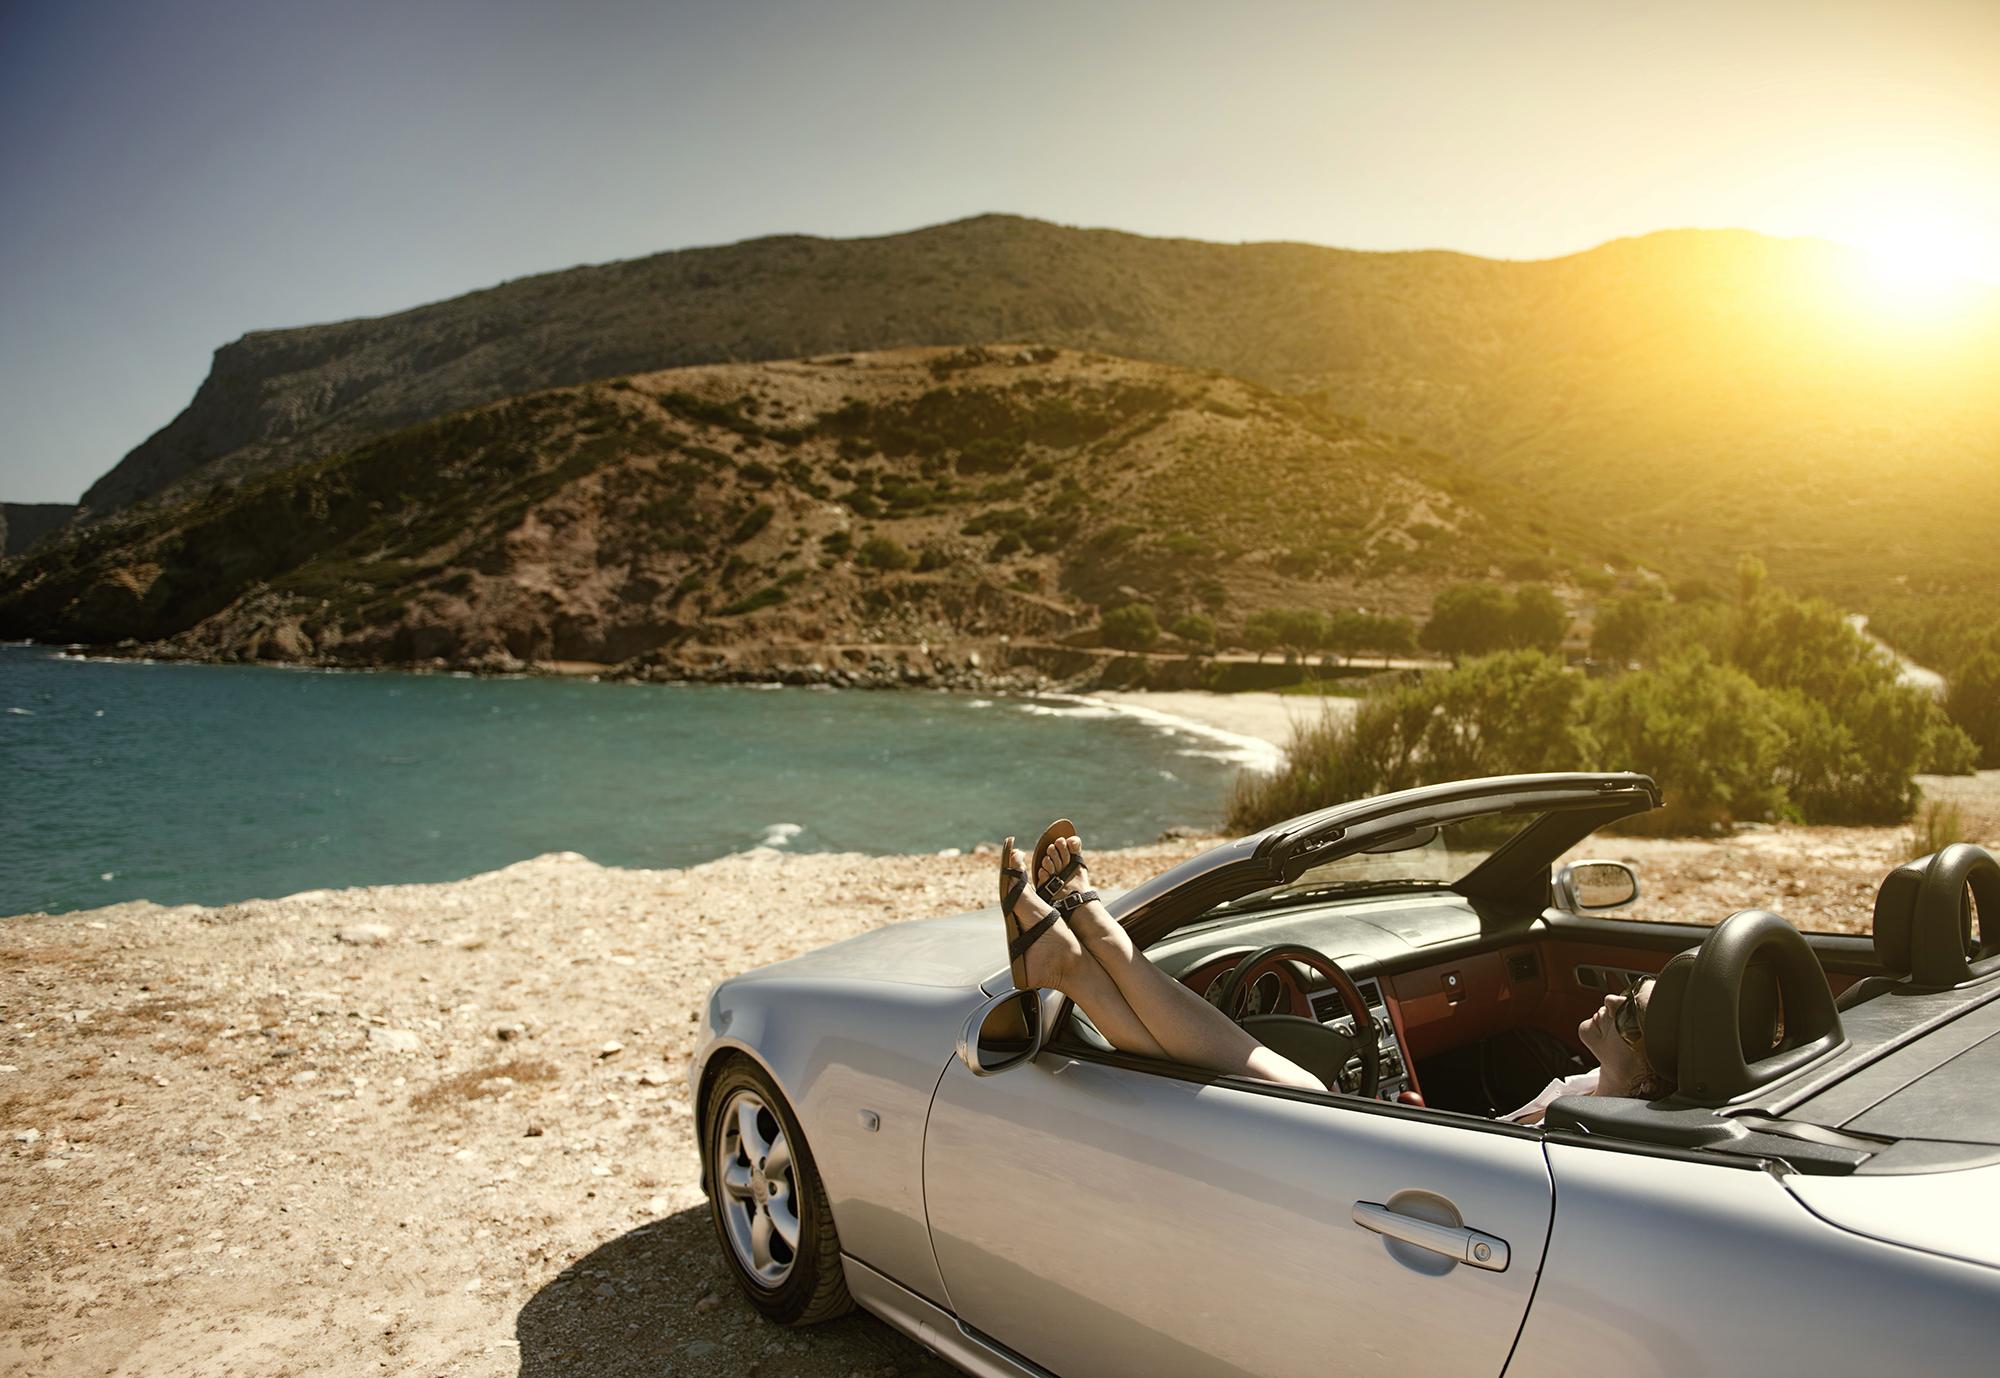 Woman relaxing in a luxury car. (Image: Shutterstock)